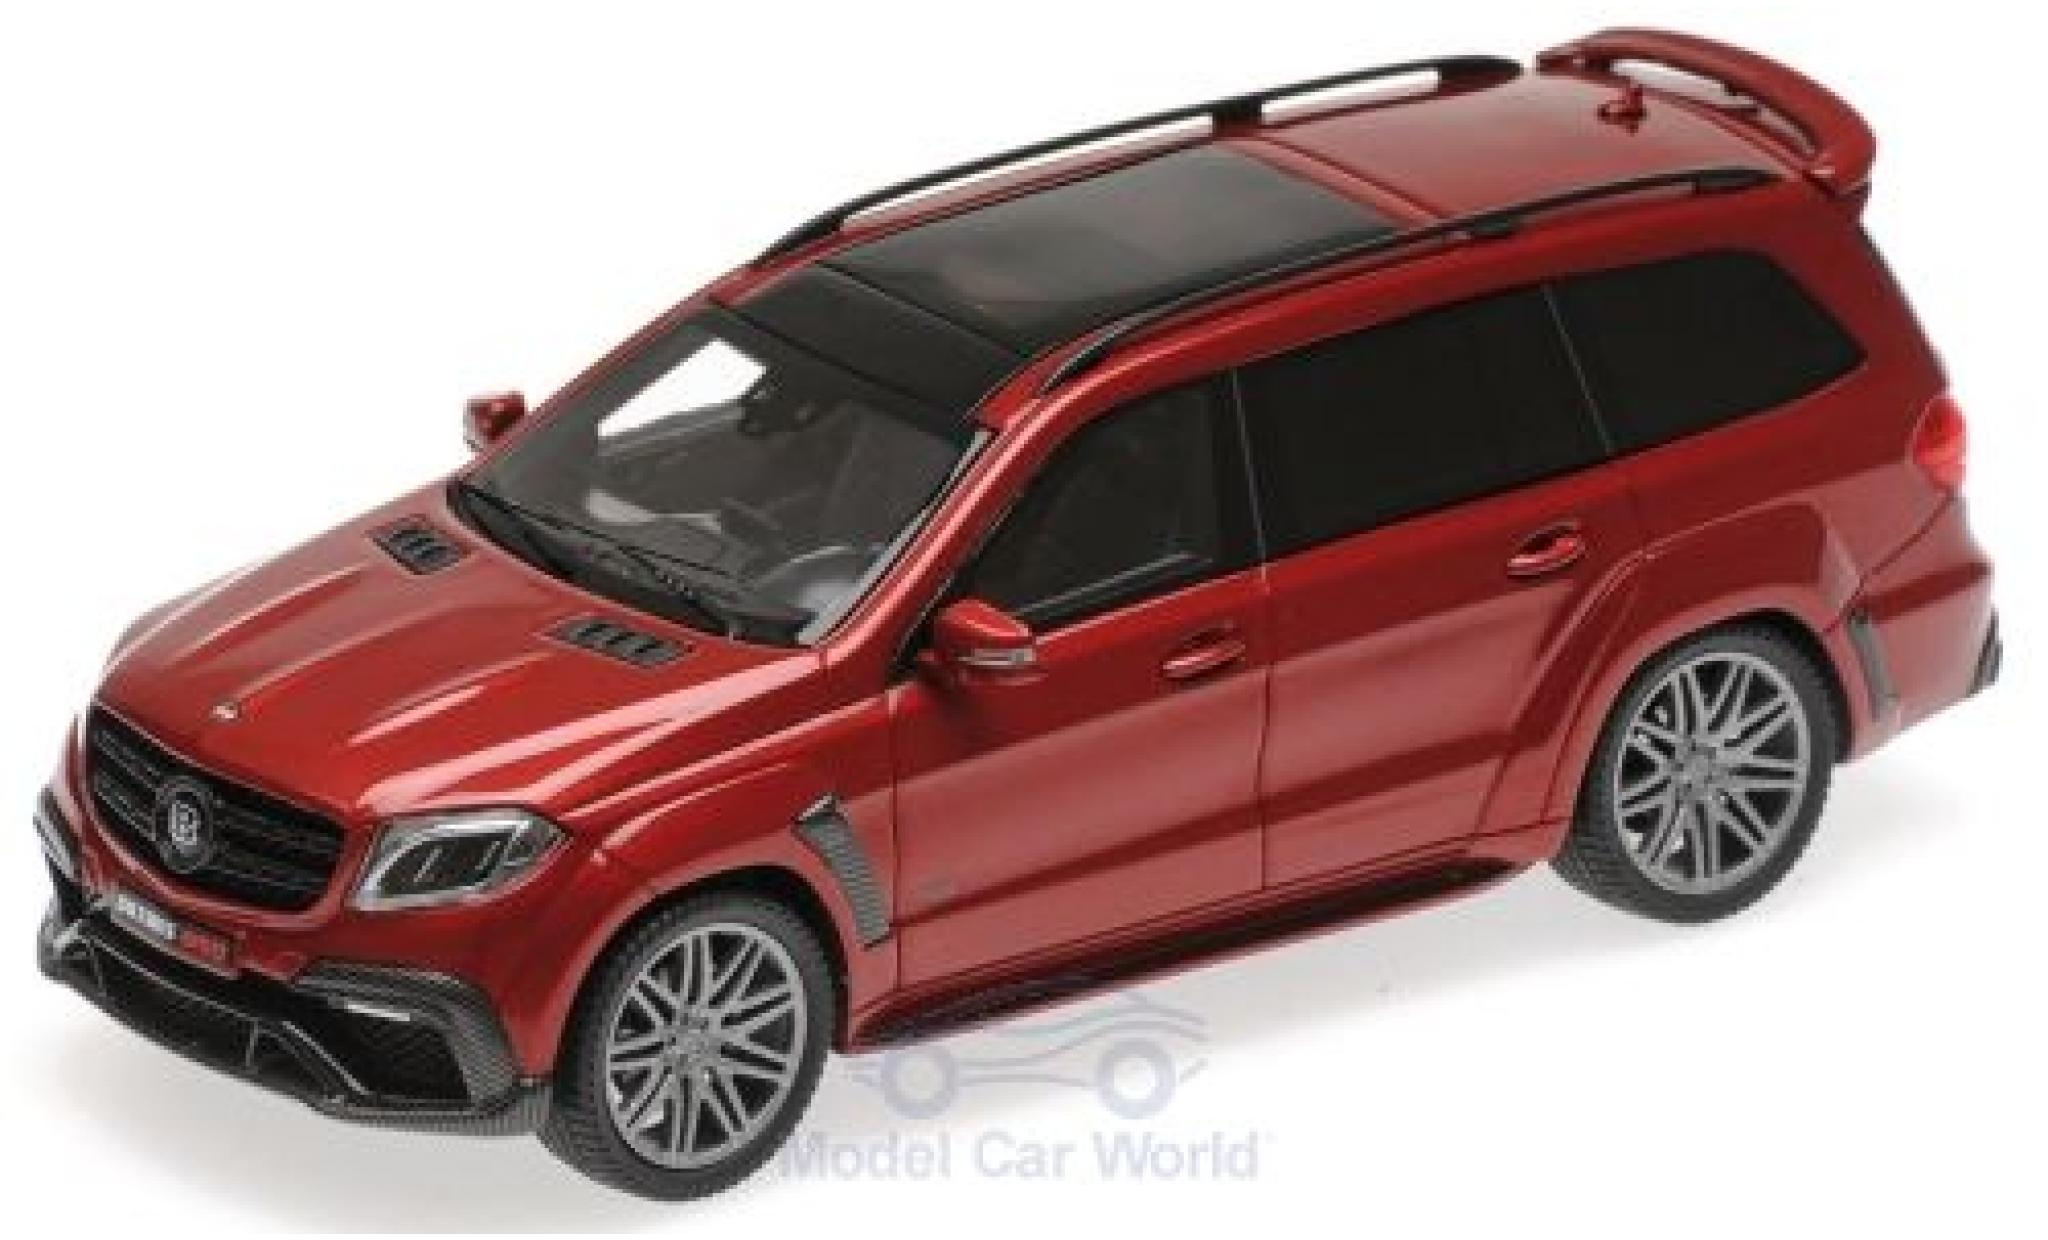 Mercedes Classe S 1/43 Minichamps Brabus 850 Widestar XL métallisé rouge 2017 Basis AMG GLS 63